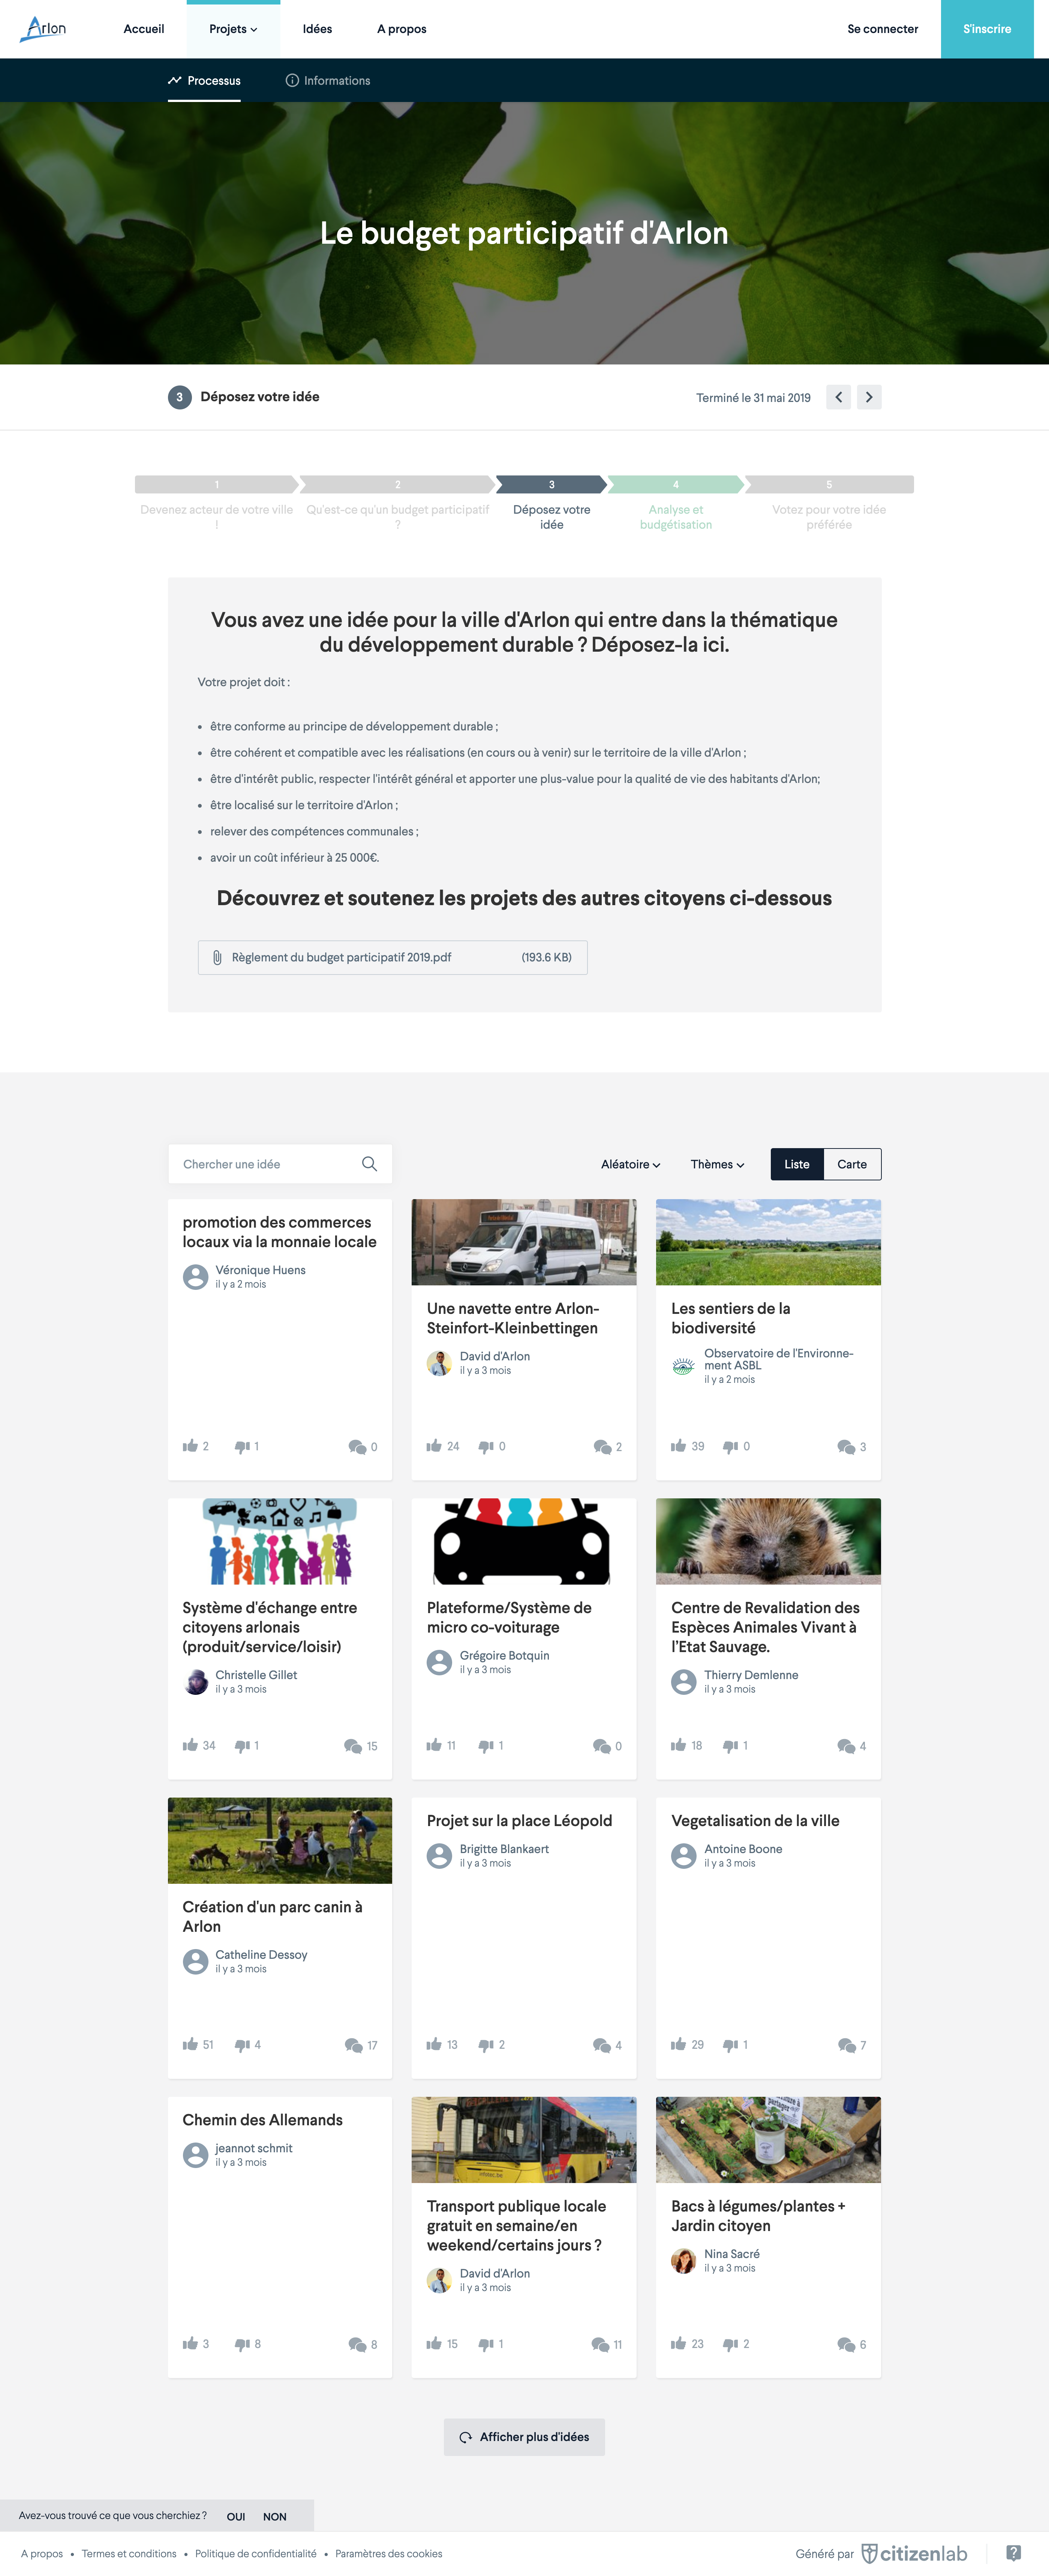 Screenshot of citizen platform showing a timeline